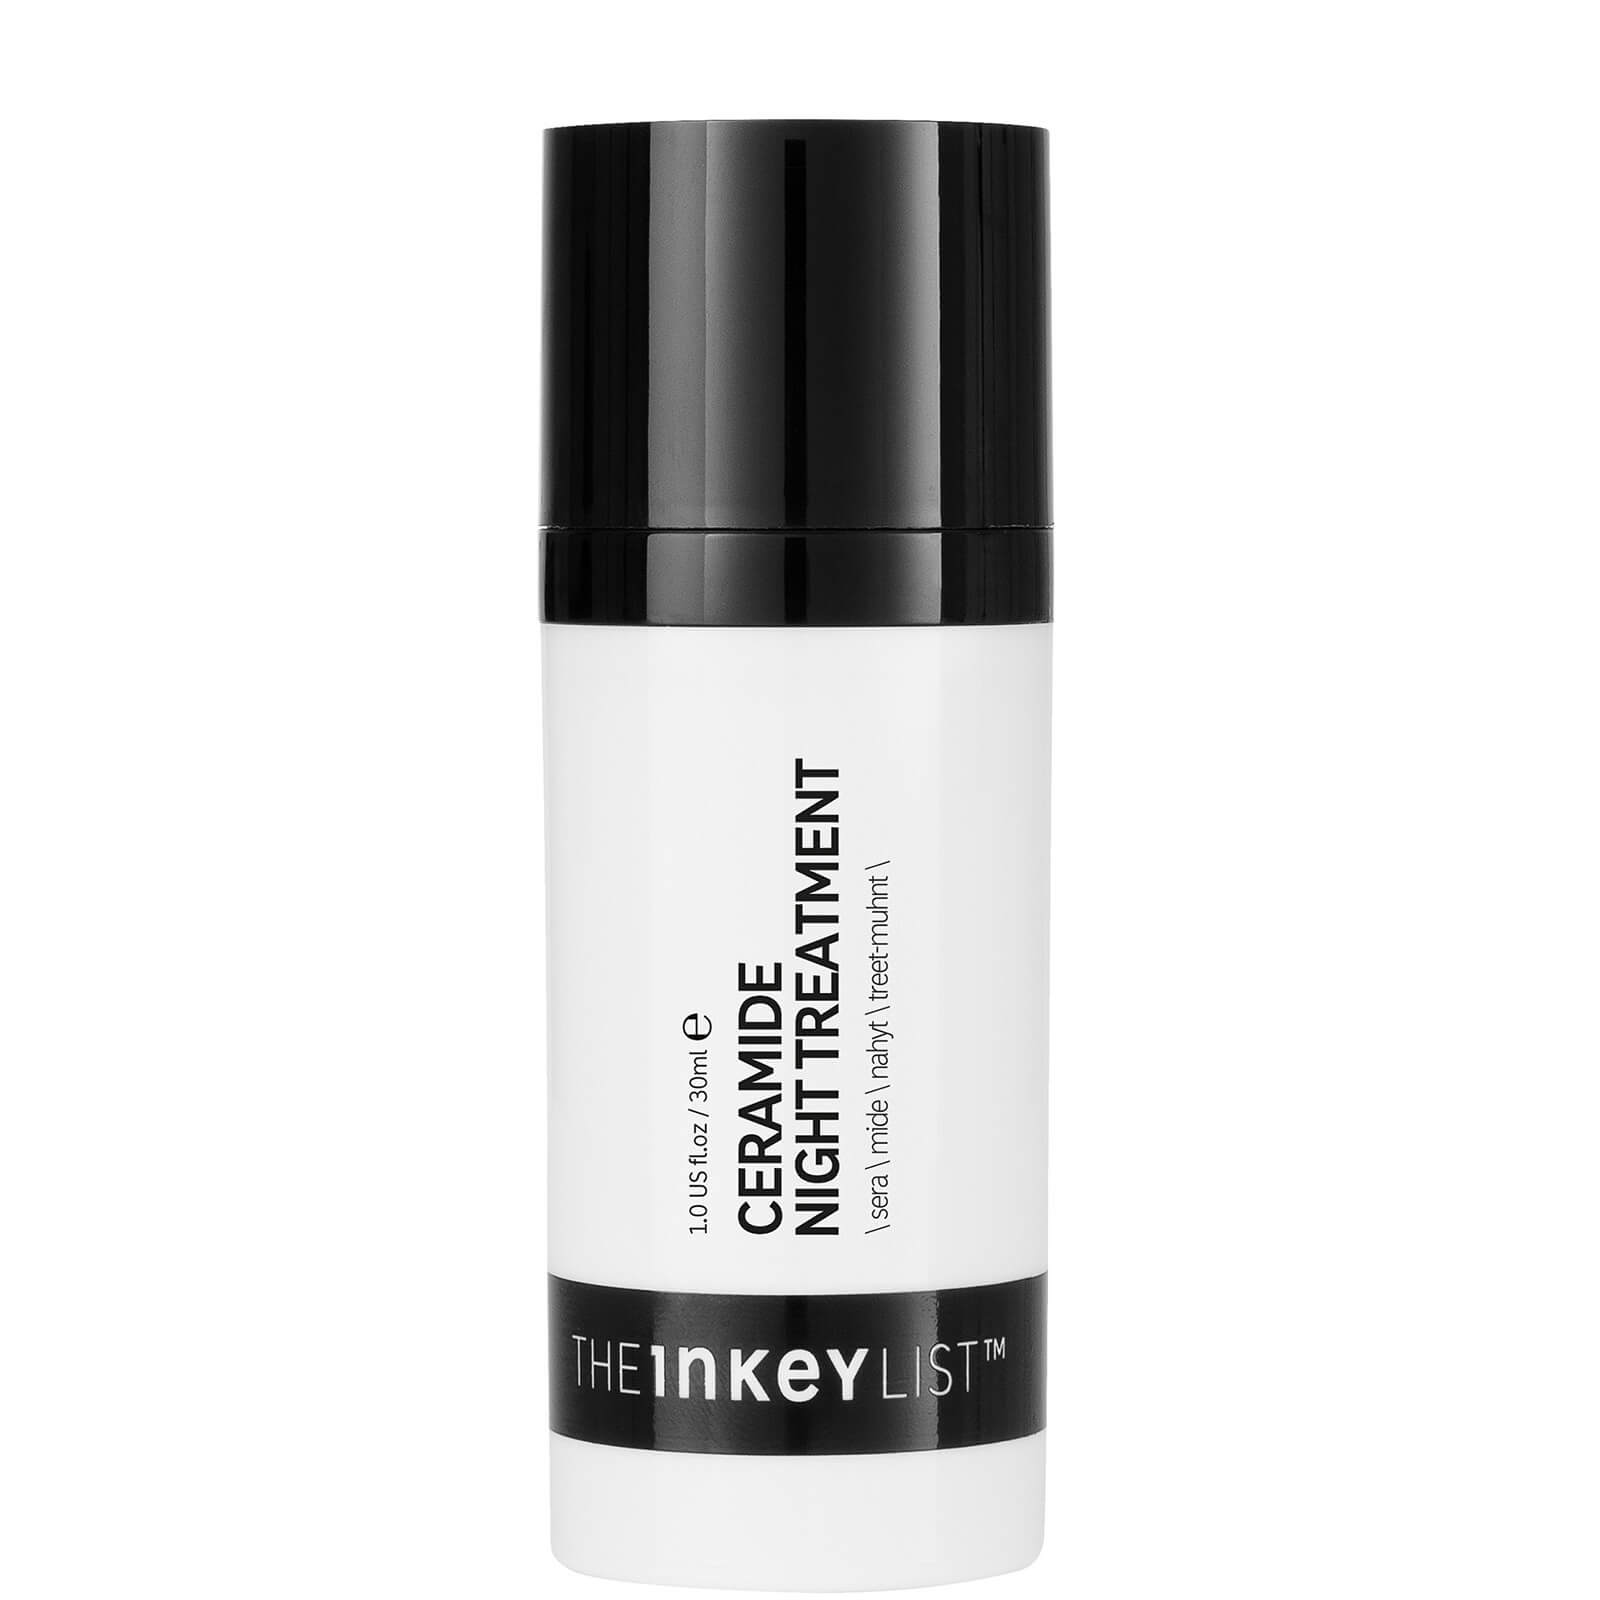 The Inkey List Ceramide Night Treatment 30ml